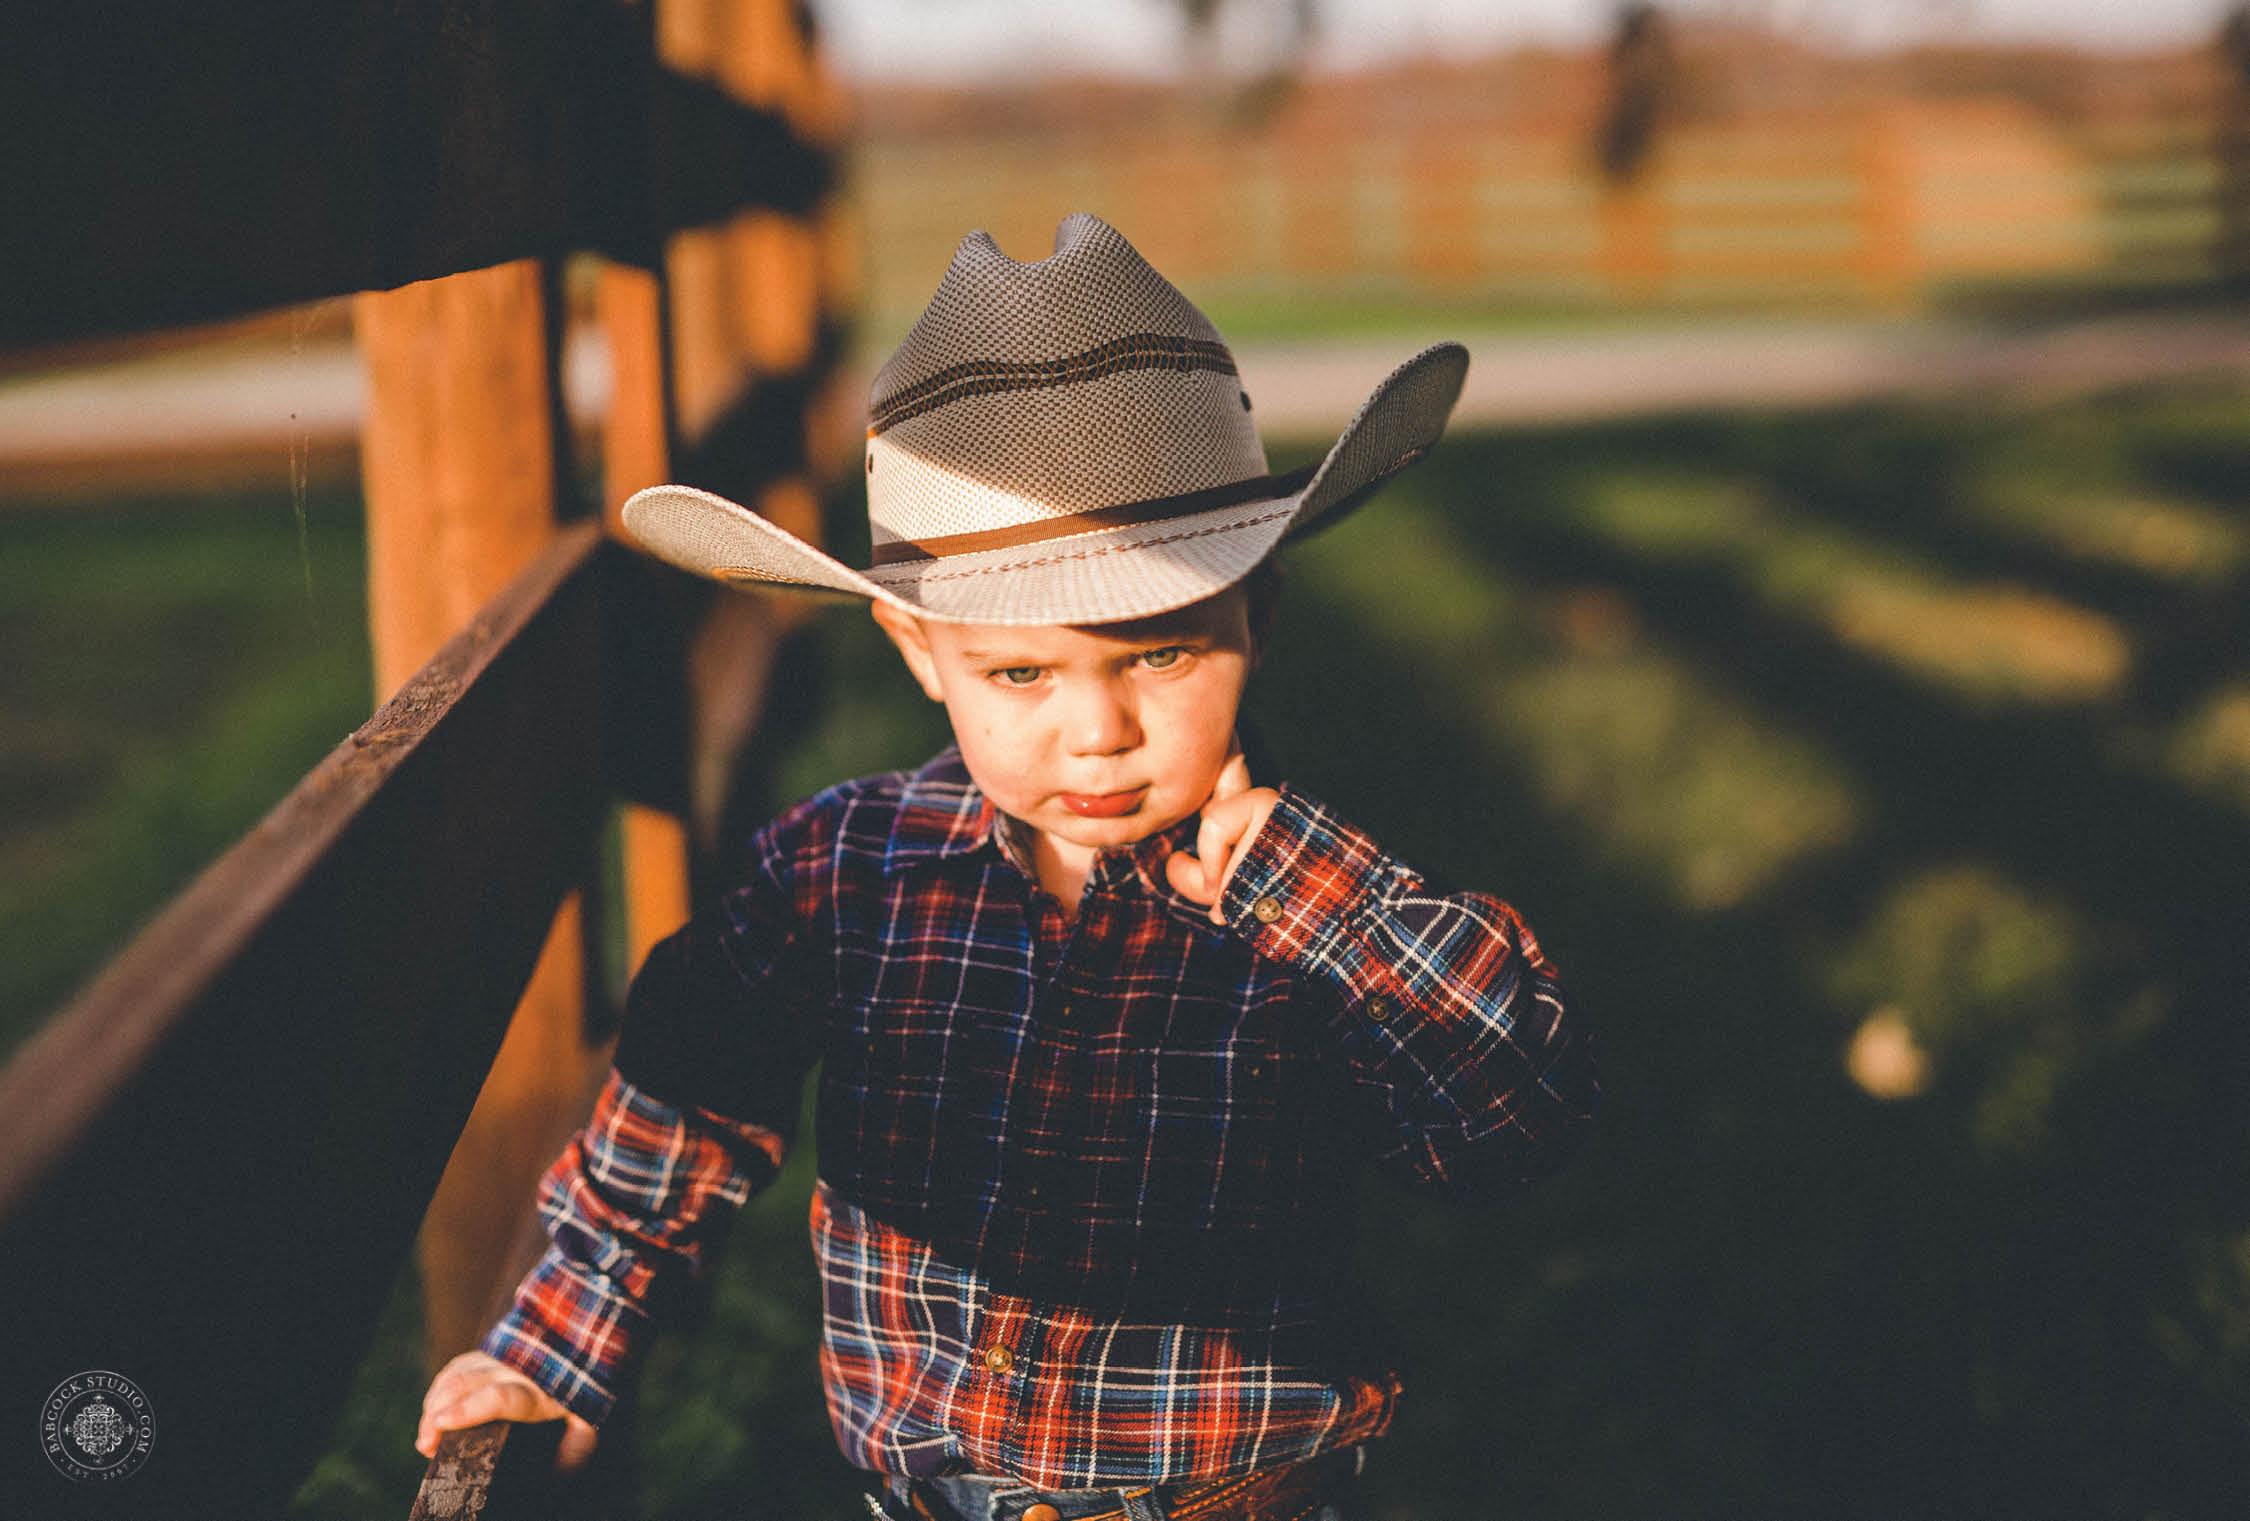 vance-family-children-photographer-dayton-ohio-9.jpg